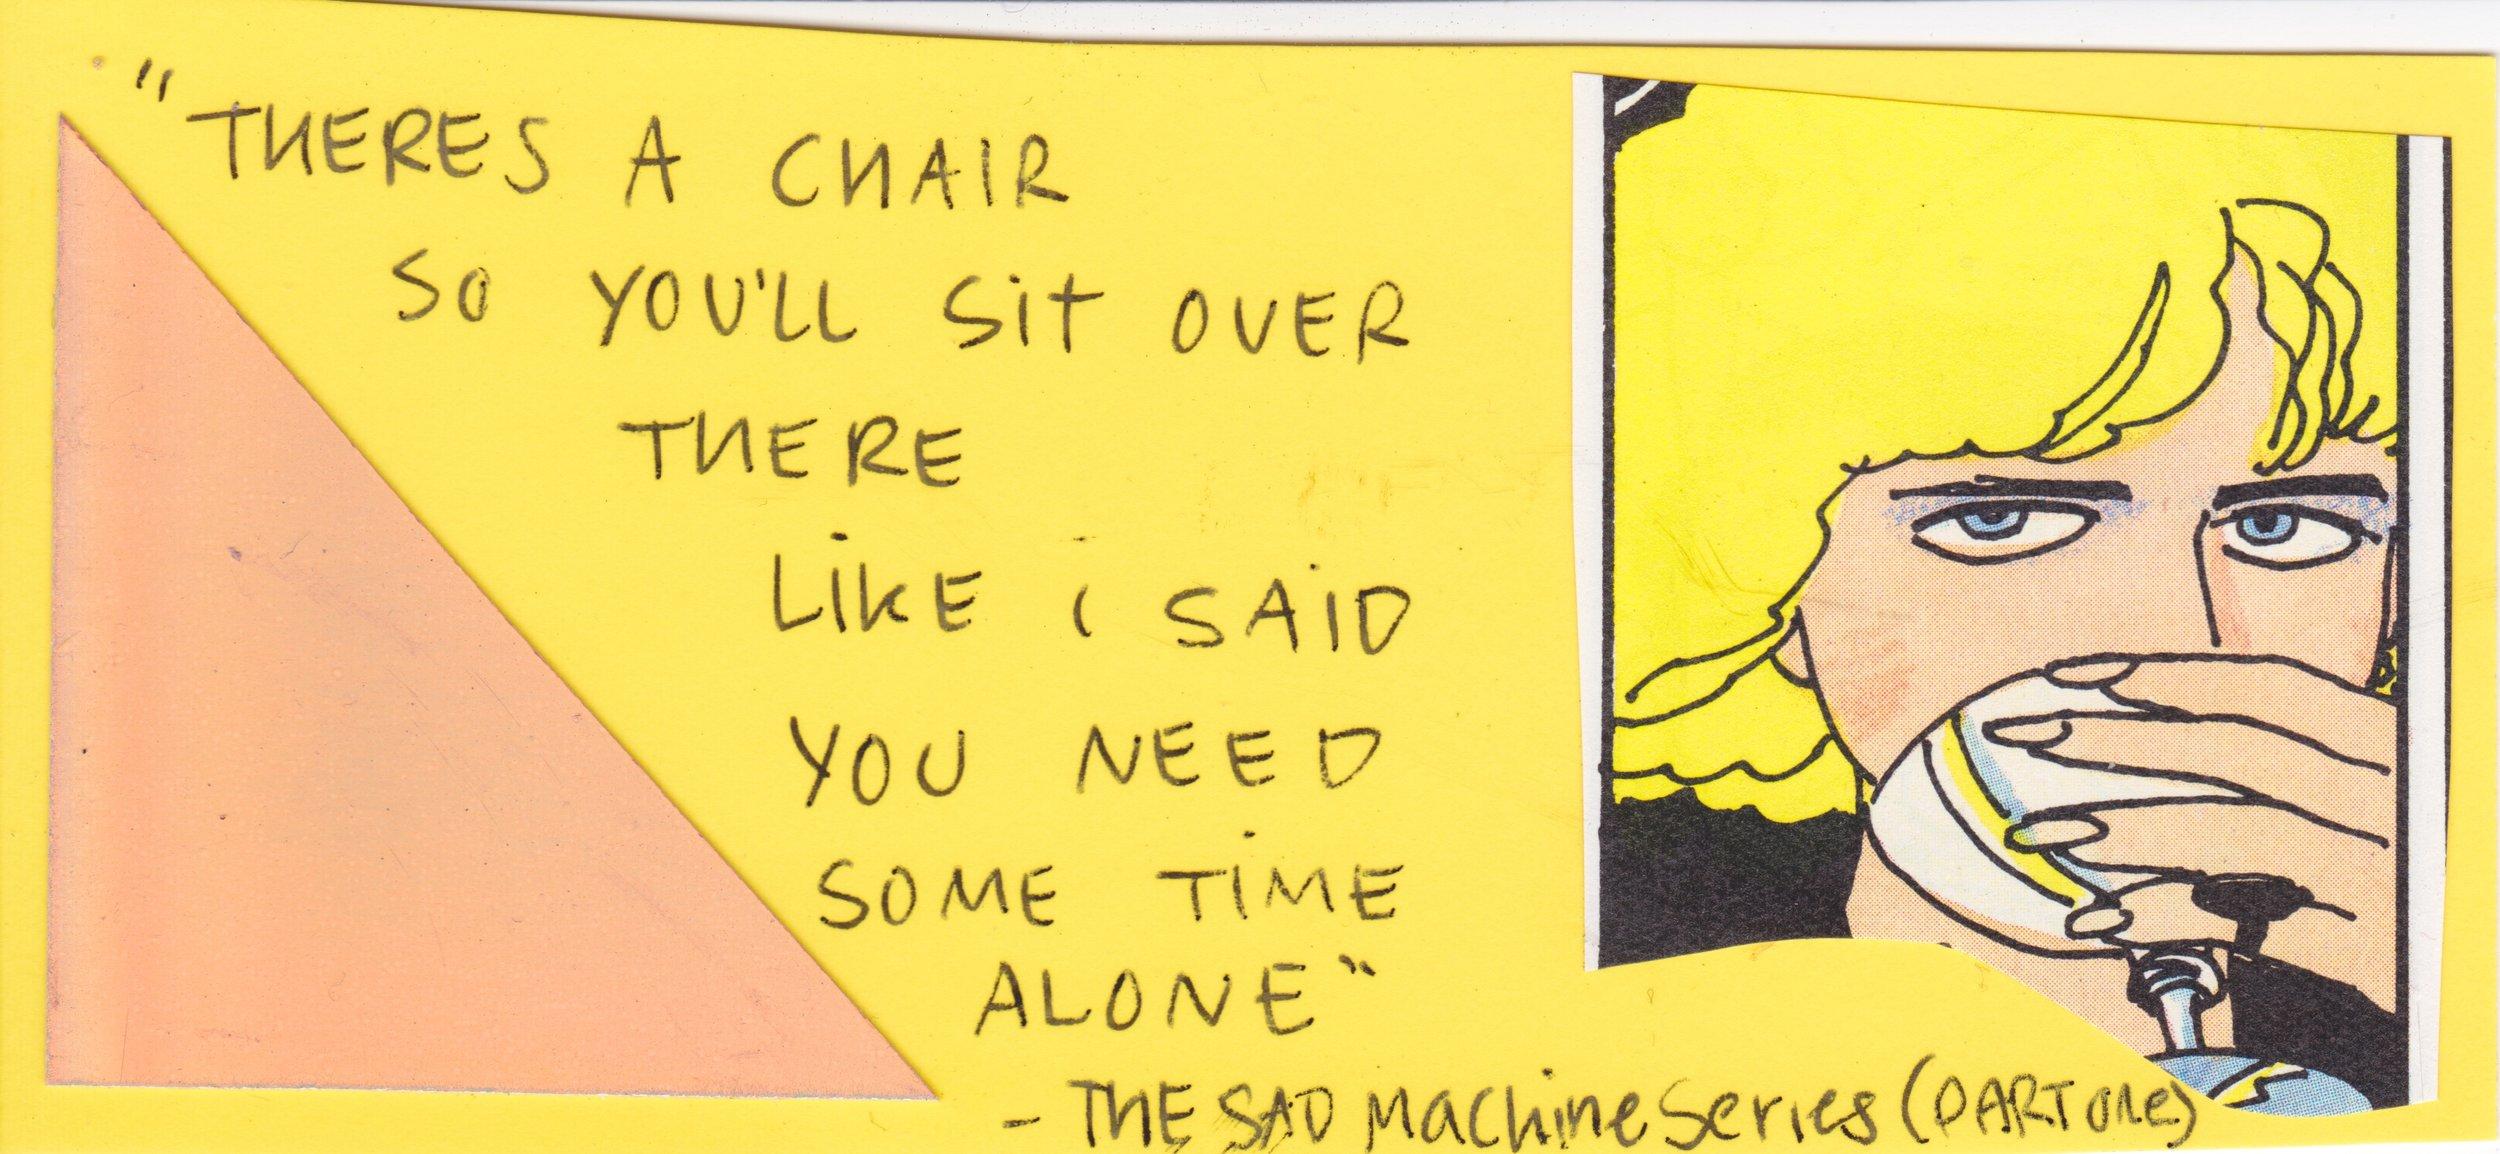 Sad Machine Series Quotes 4.jpeg